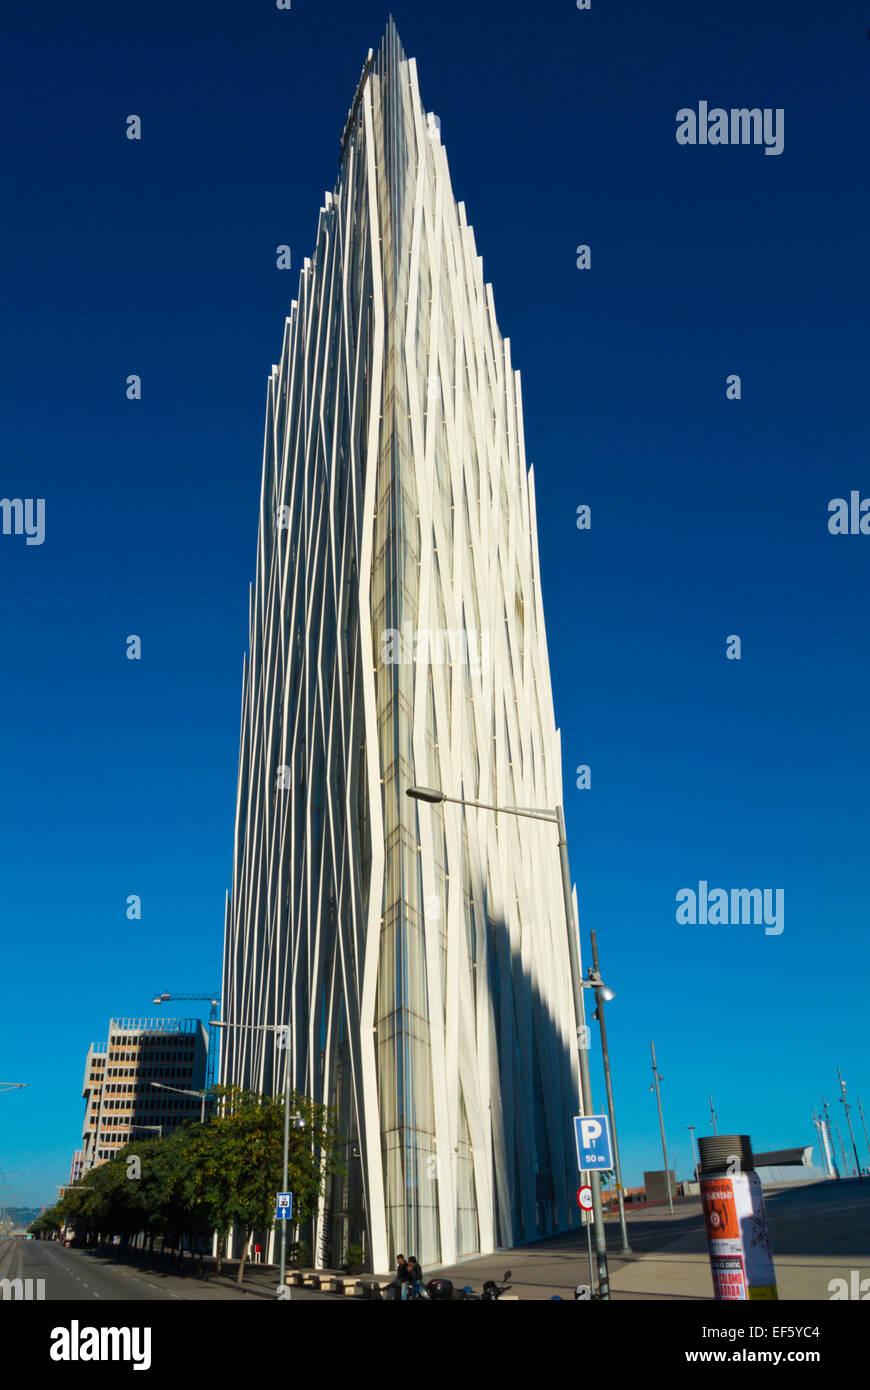 Torre Diagonal Zero Zero, Forum Gebäudefläche, Diagonal Mar, Sant Marti Bezirk, Barcelona, Spanien Stockbild